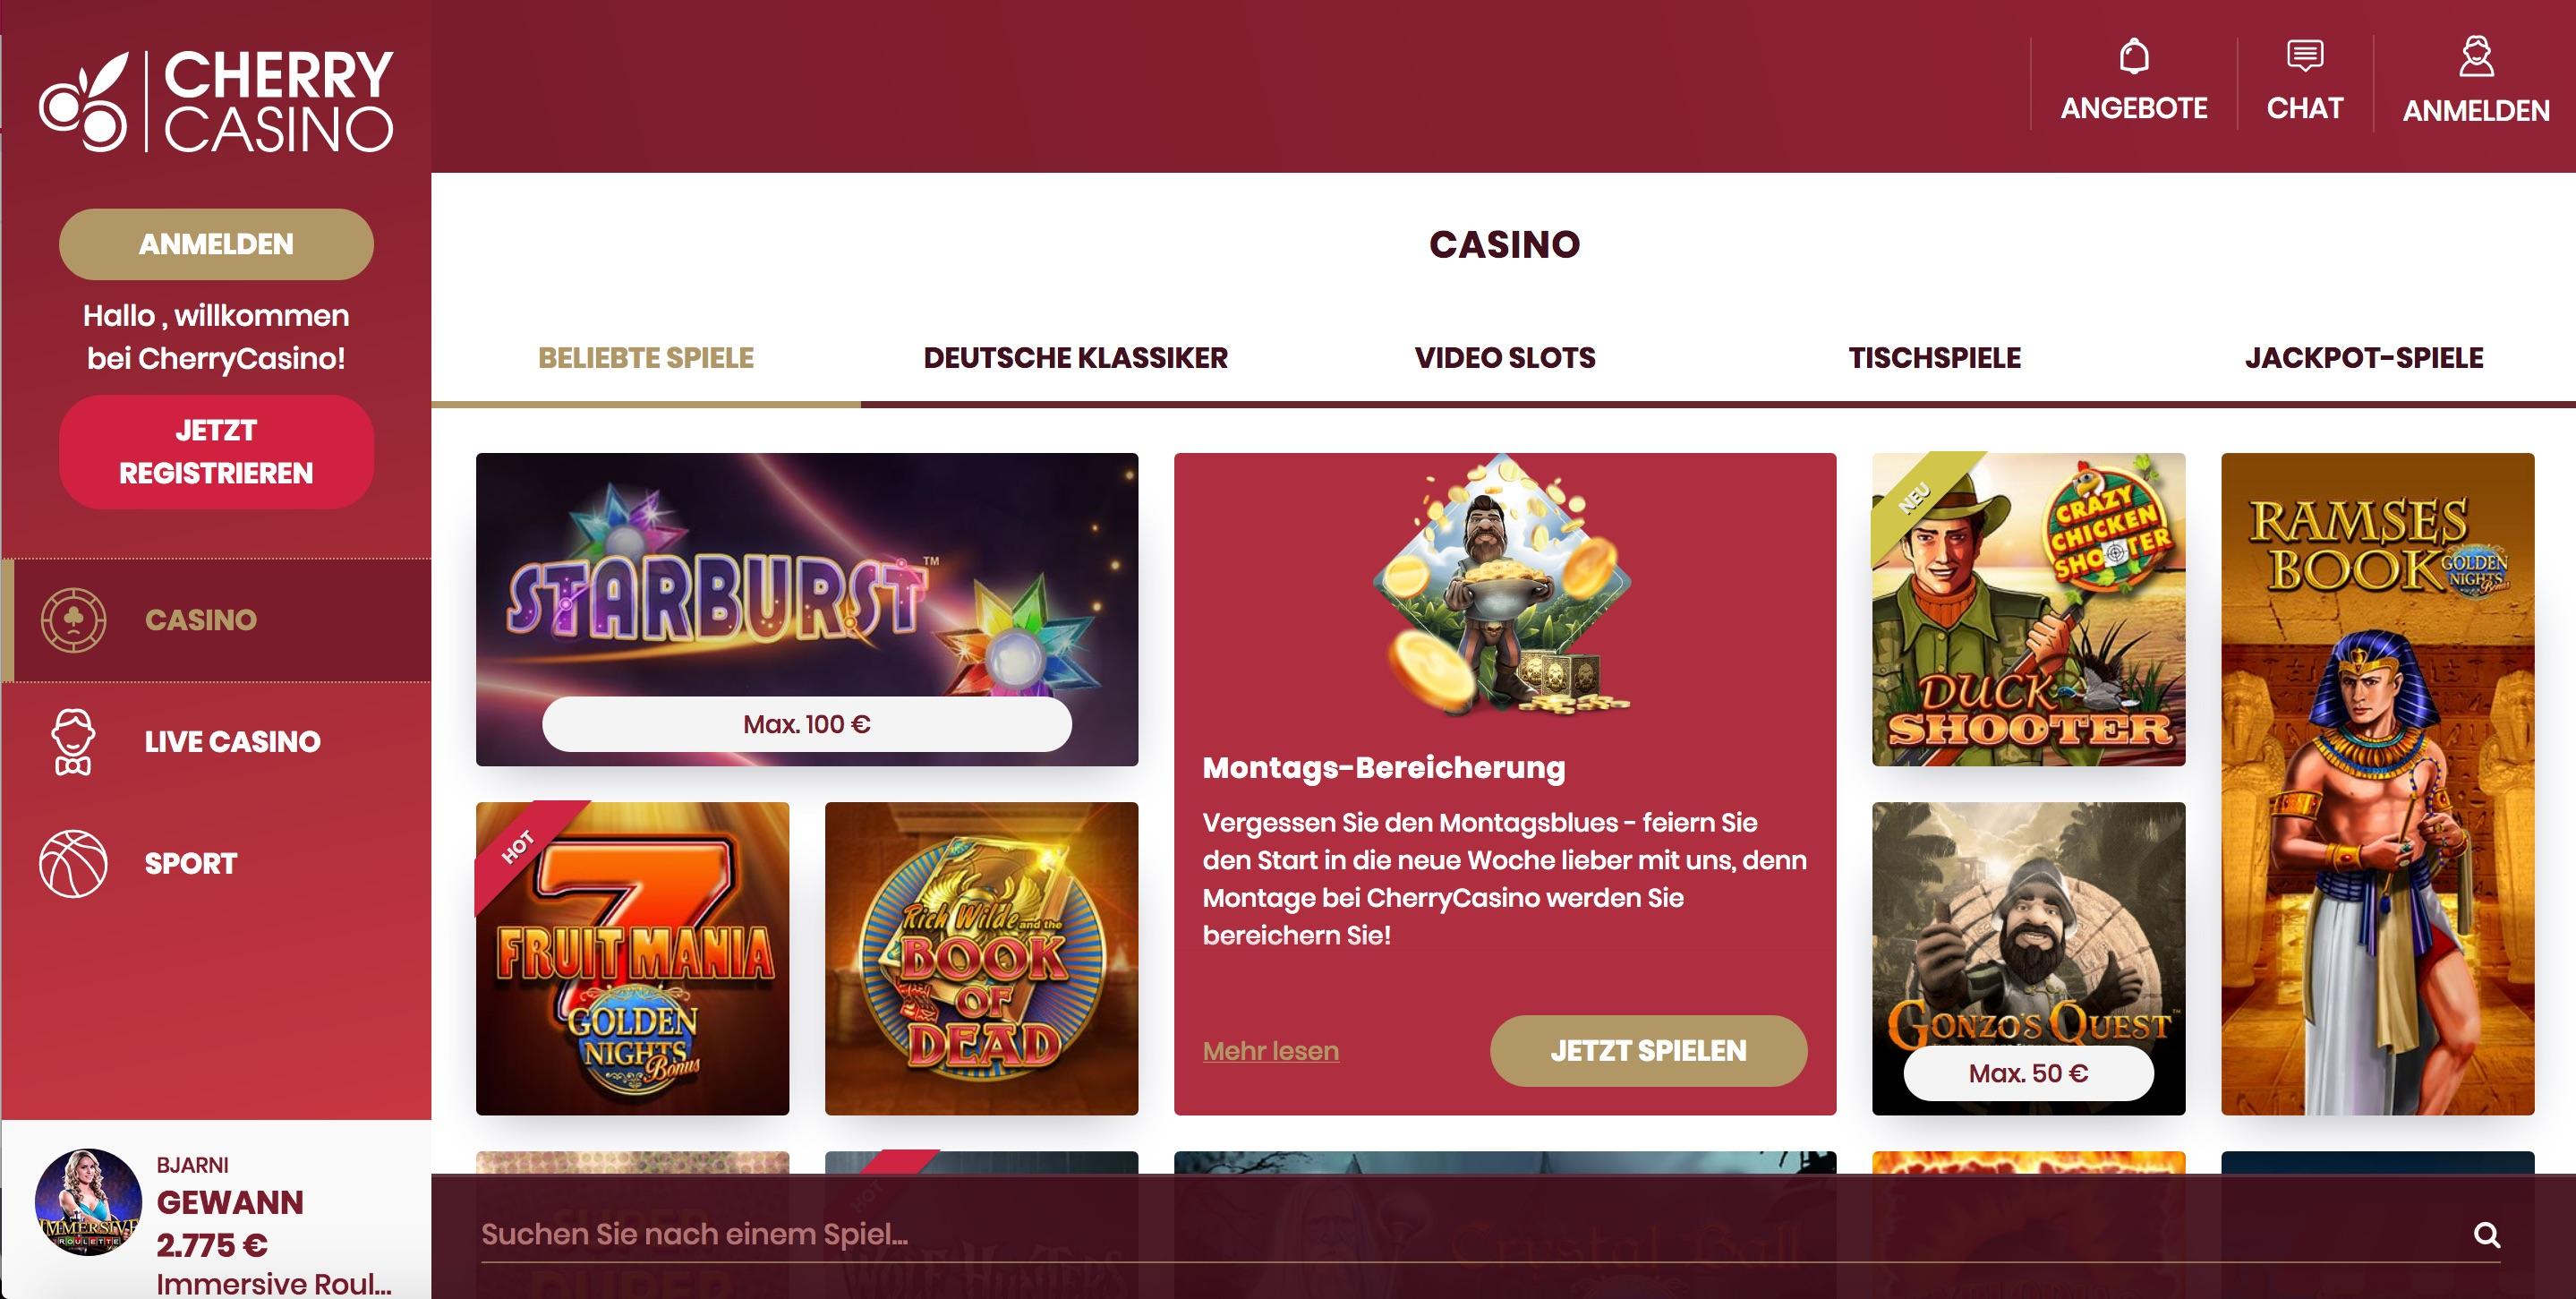 Cherry Casino Spiele